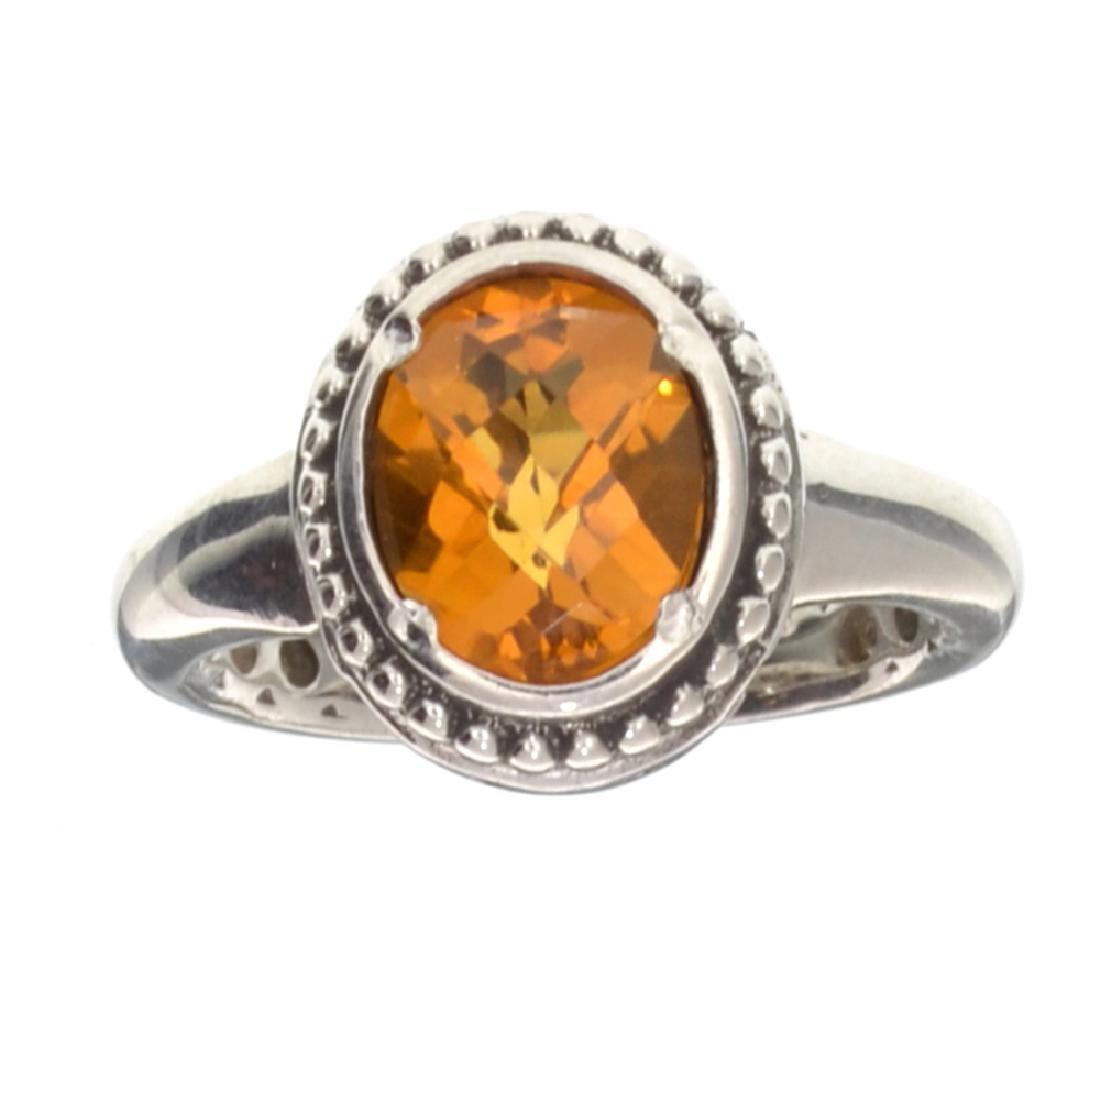 APP: 0.6k Fine Jewelry Designer Sebastian 2.59CT Oval